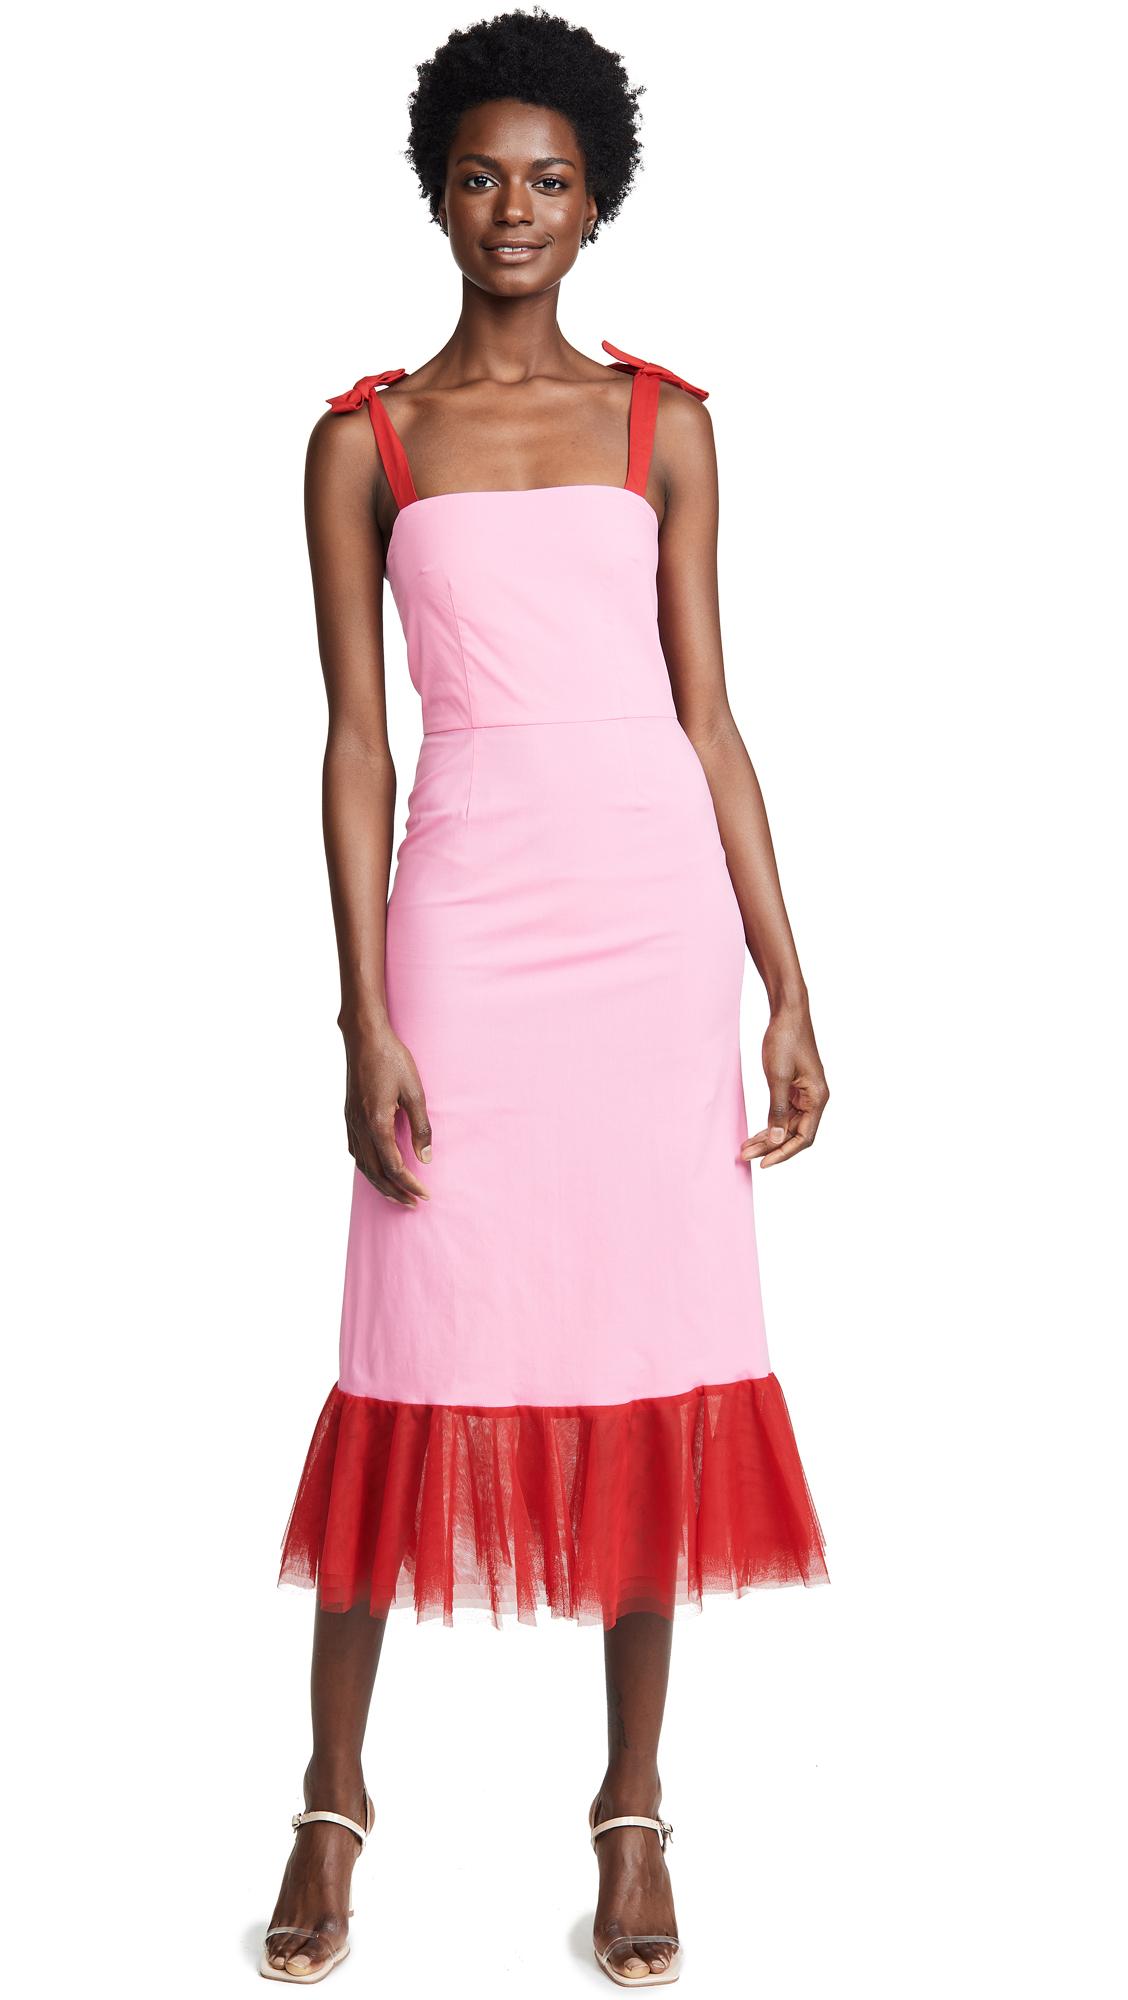 STAUD Langdon Dress In Pink/Red